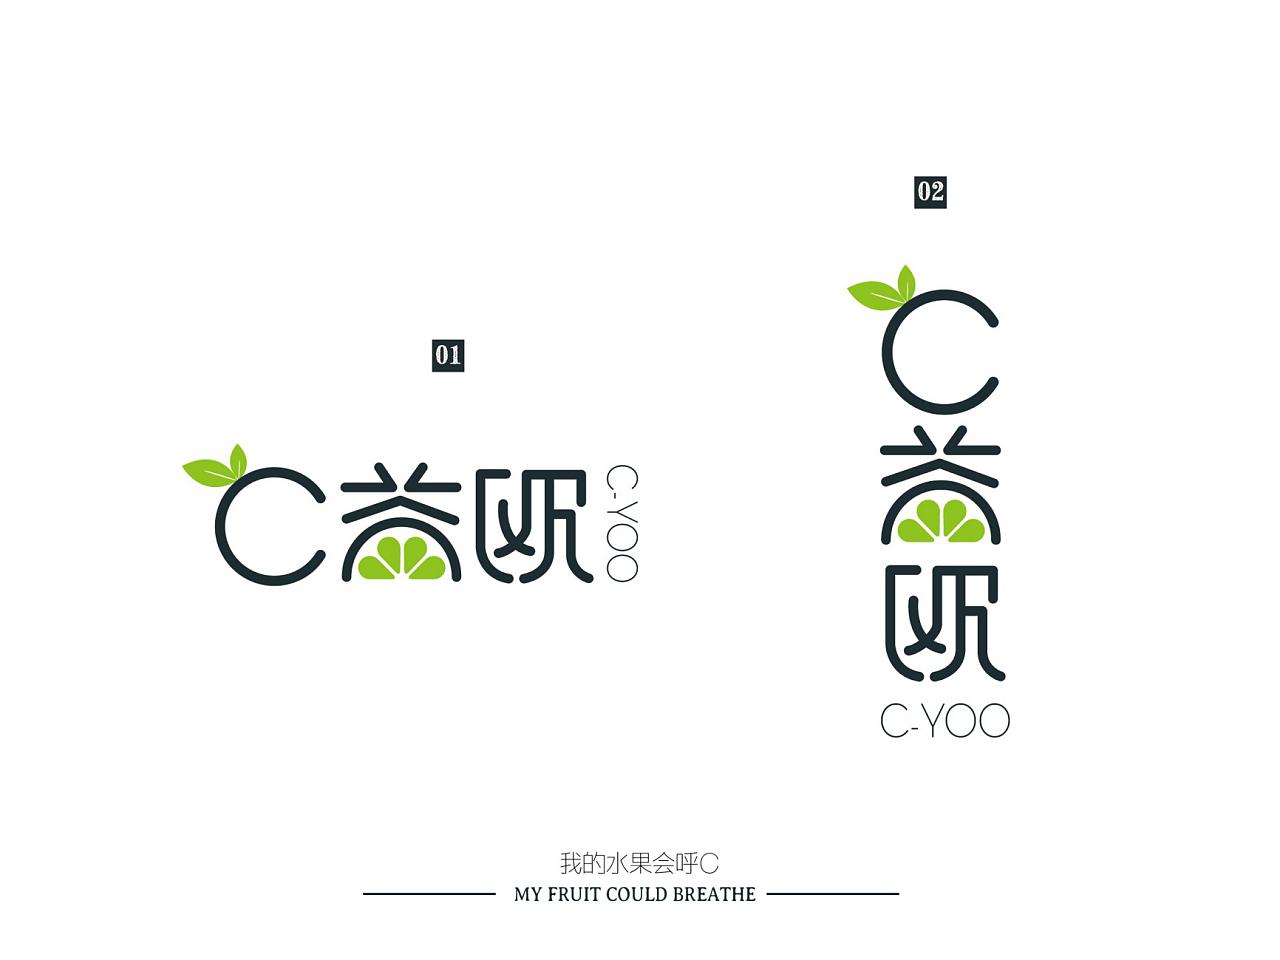 C益欧|Logo设计|集团|标志|天泽创意平面-原创蓝城建筑设计萨枫图片